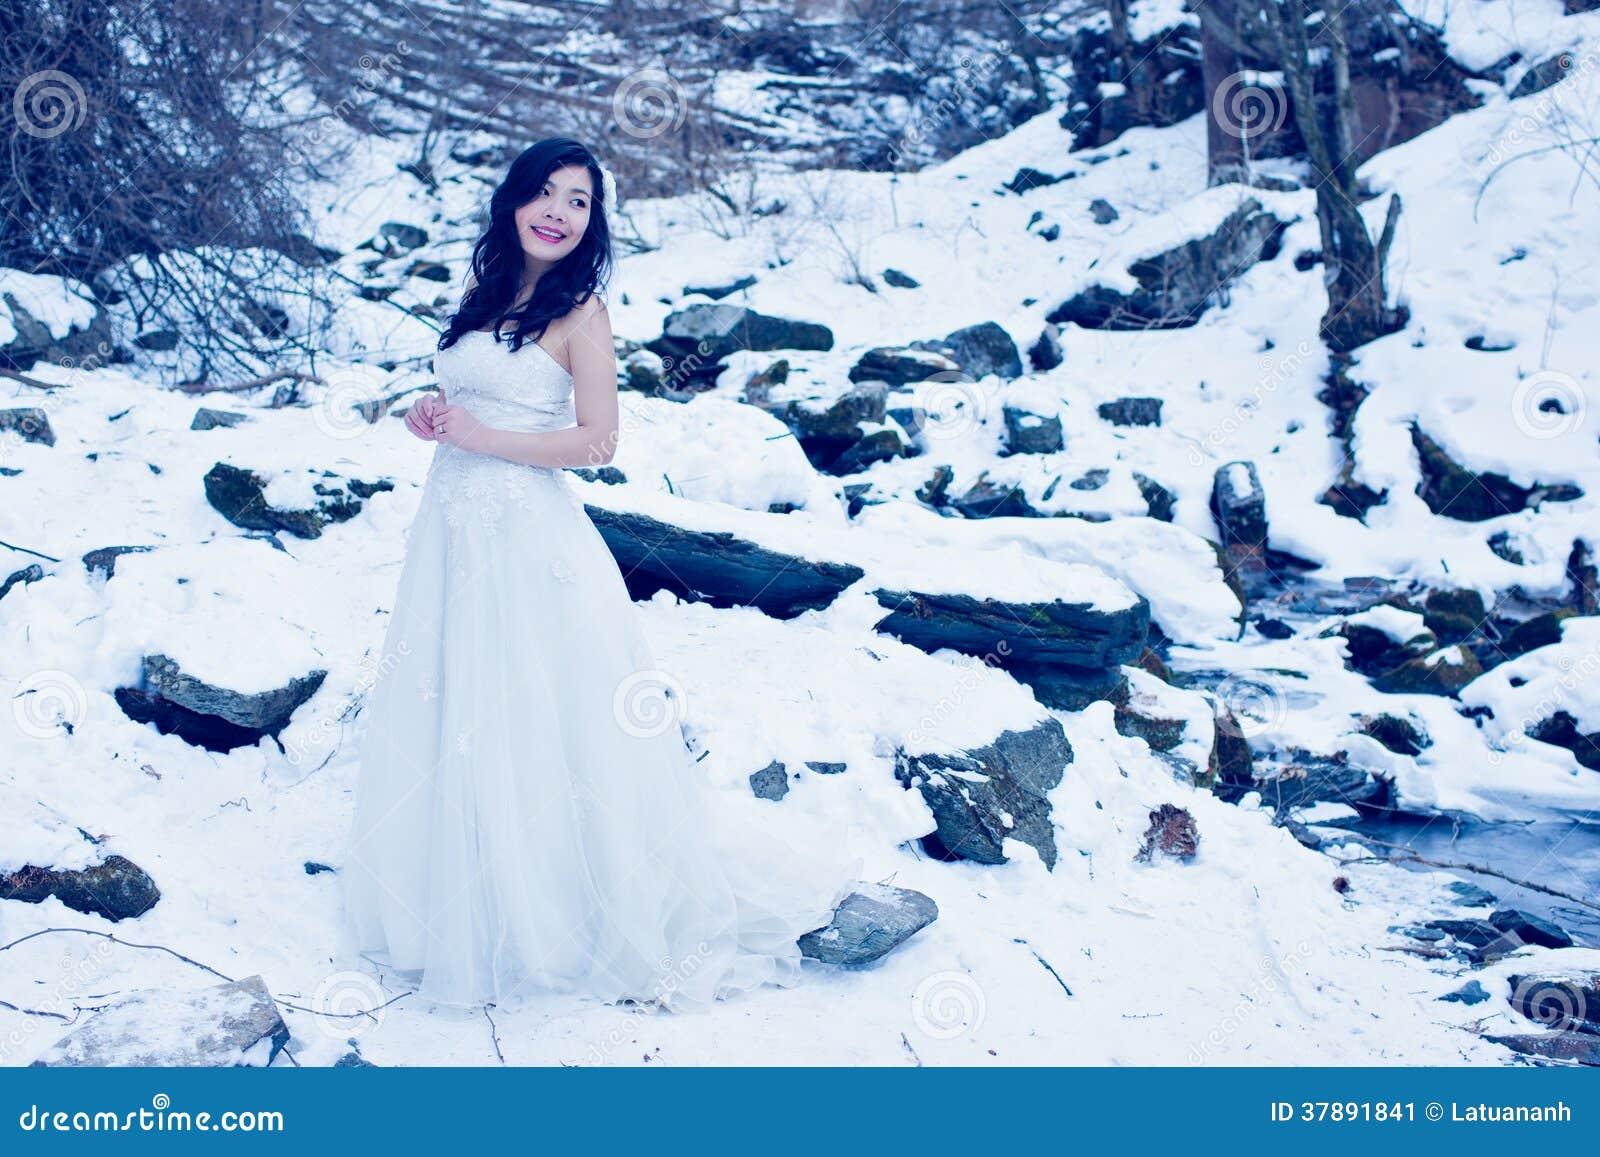 Bride on the snow